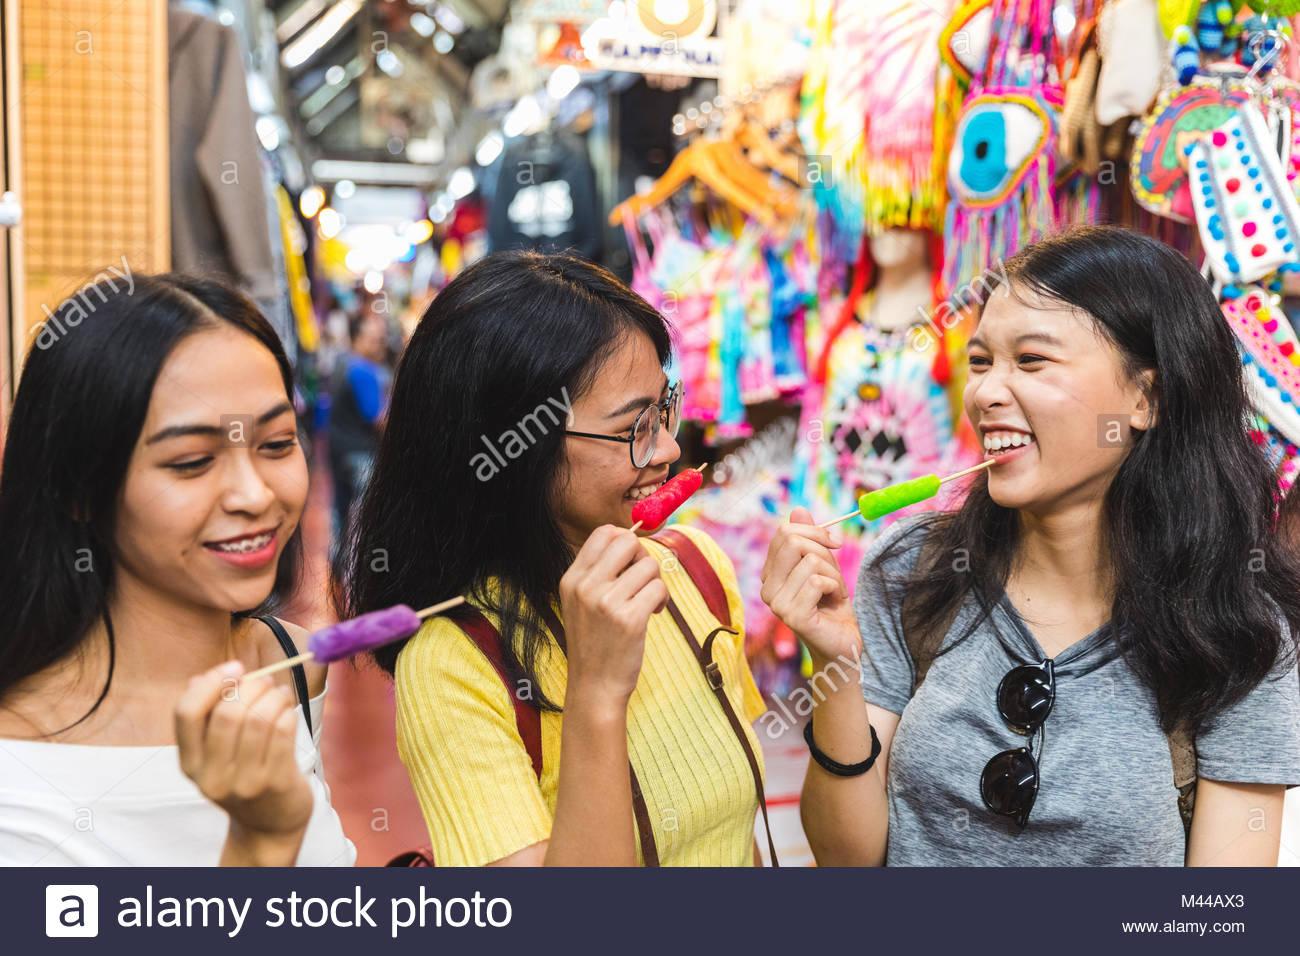 Happy young women with ice lollies in bazaar, Bangkok, Thailand Stock Photo